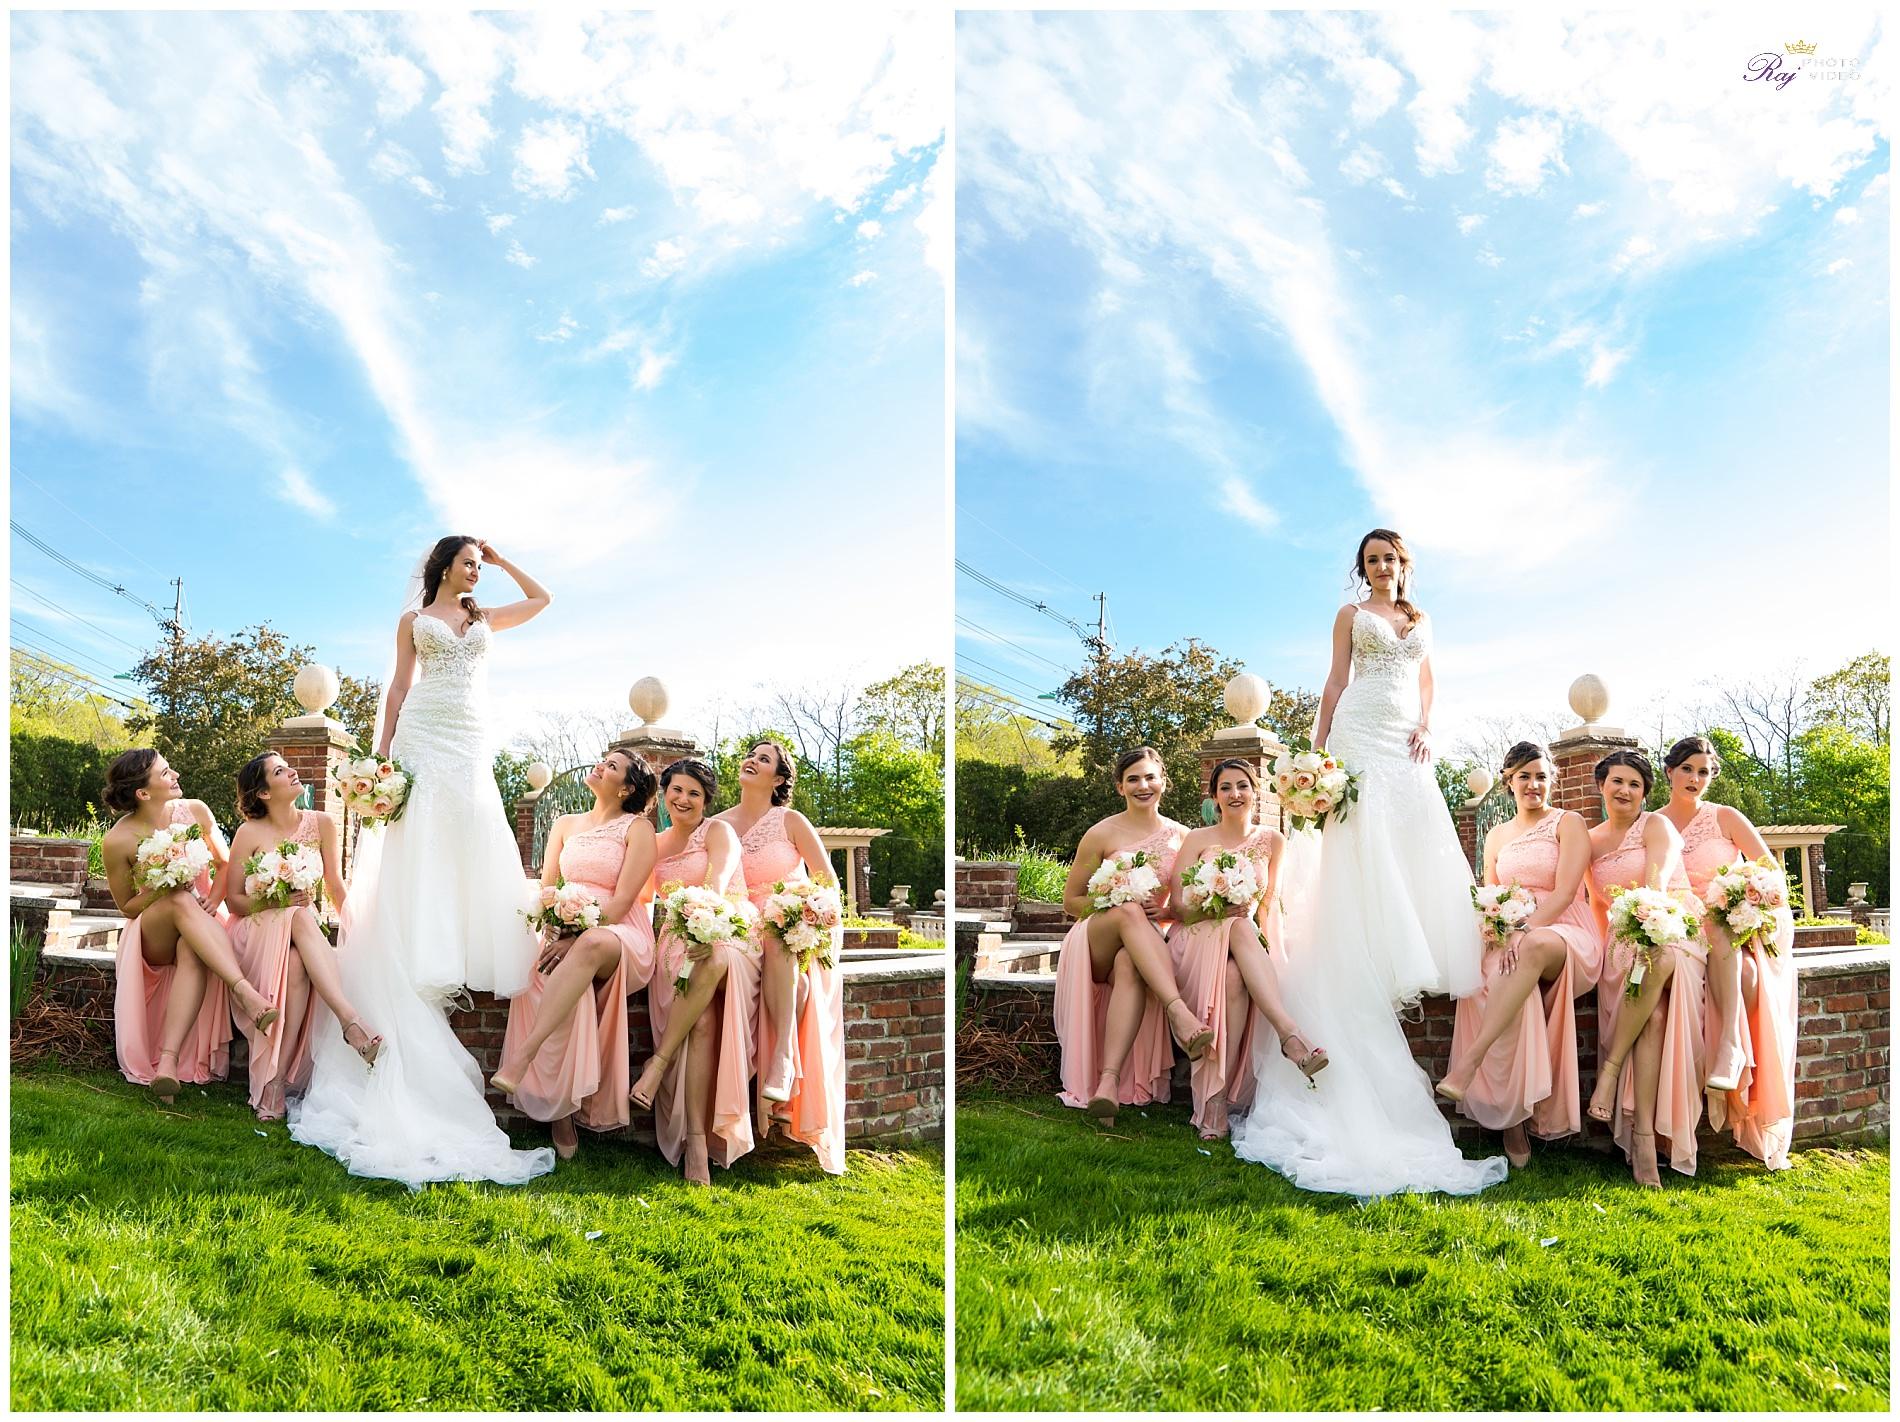 The-Manor-West-Orange-NJ-Wedding-Reception-Yanet-Jose-5.jpg